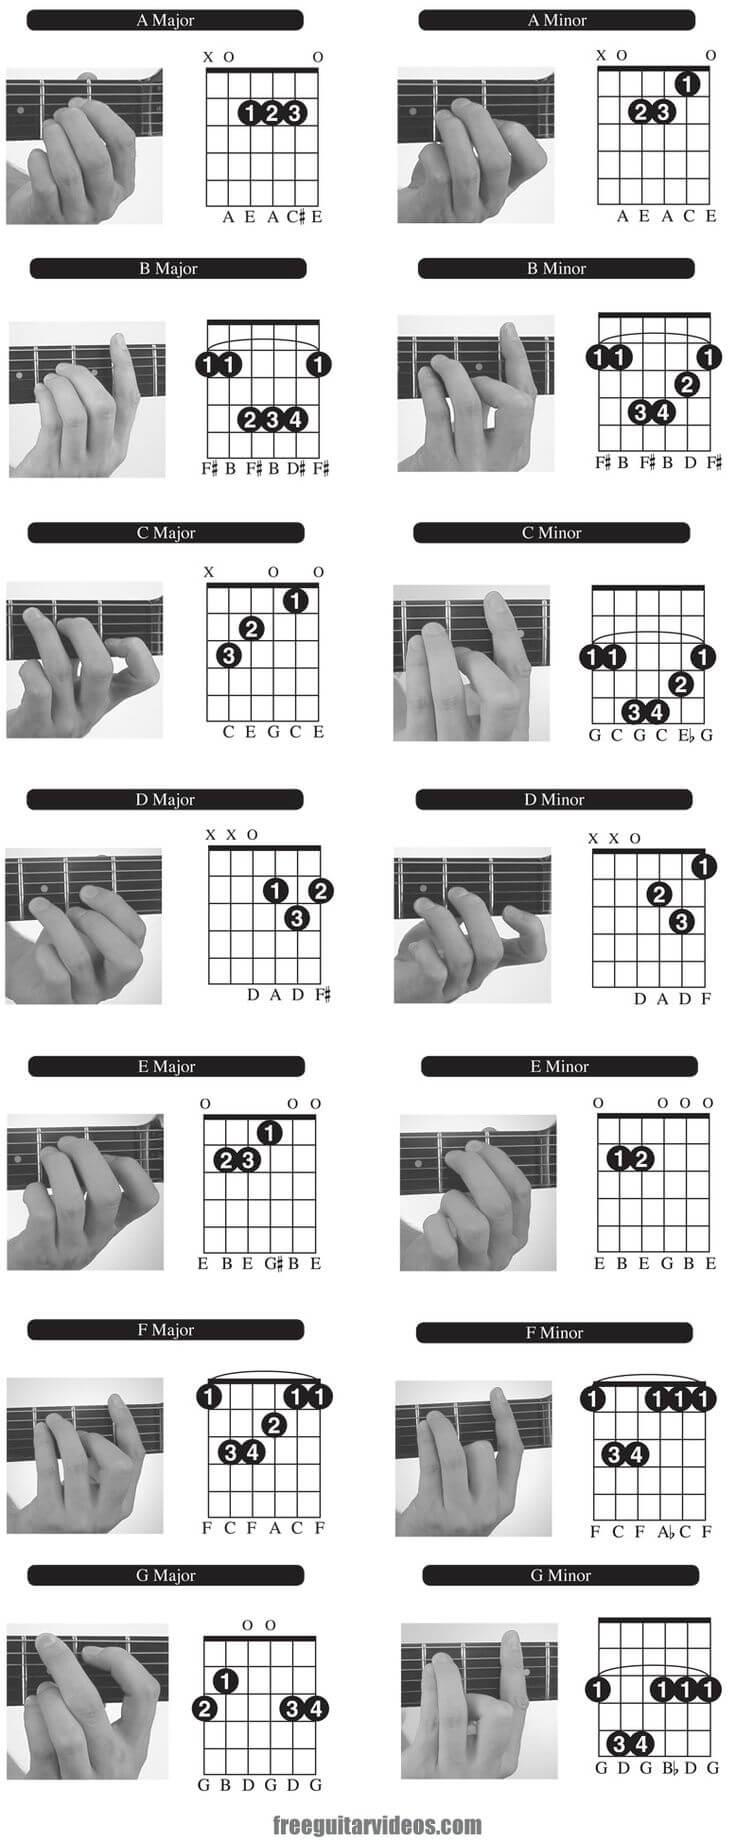 Gambar kunci gitar dengan tangan